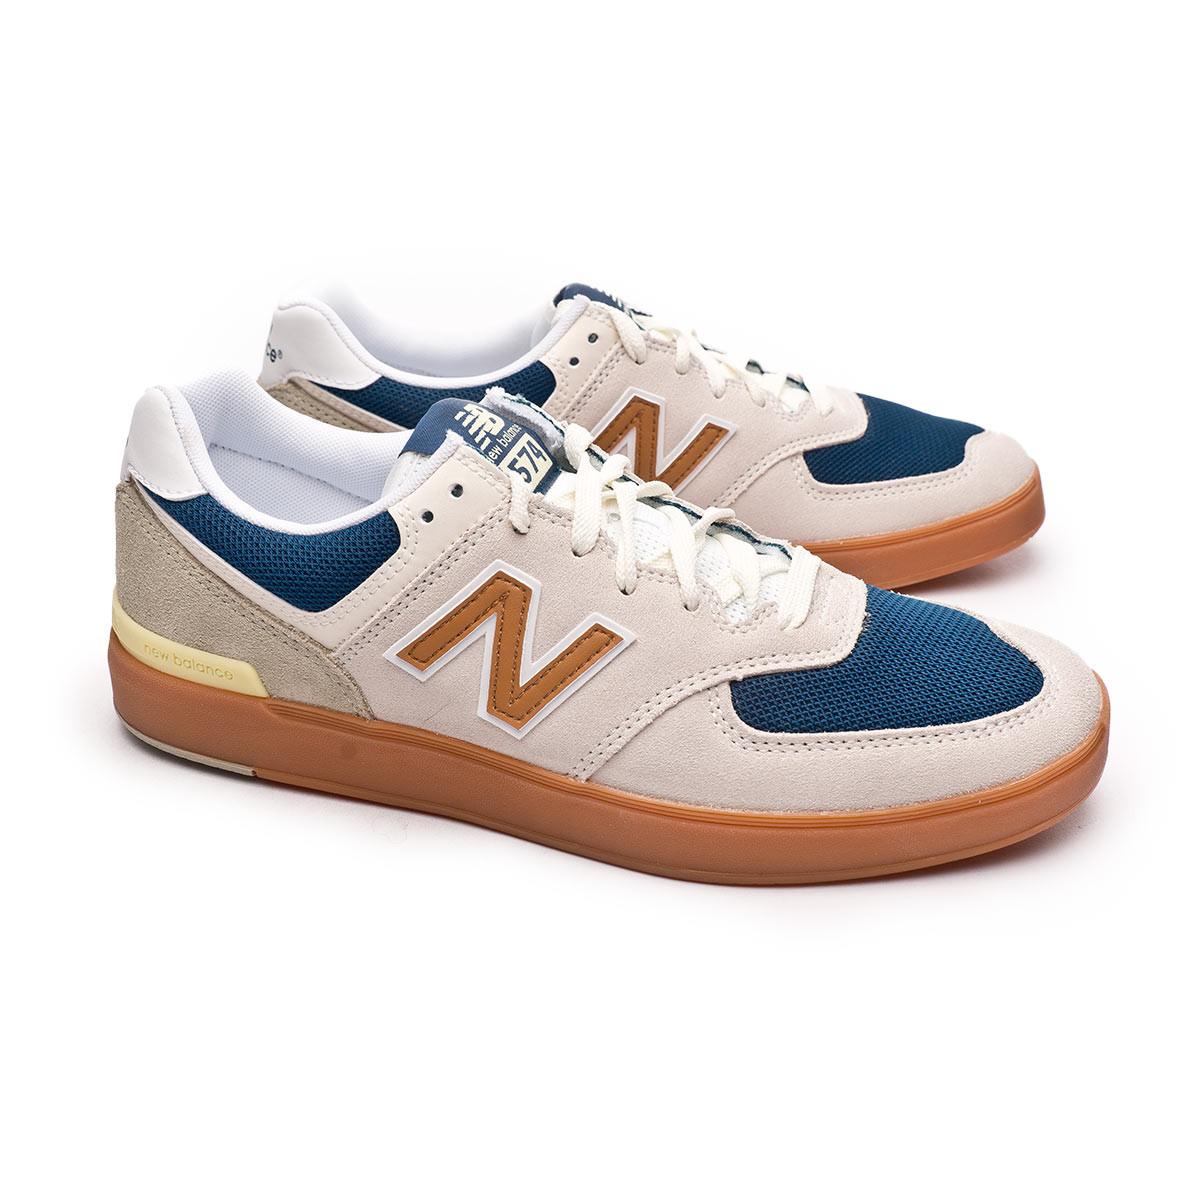 New Balance All Coasts 574 v1 Trainers